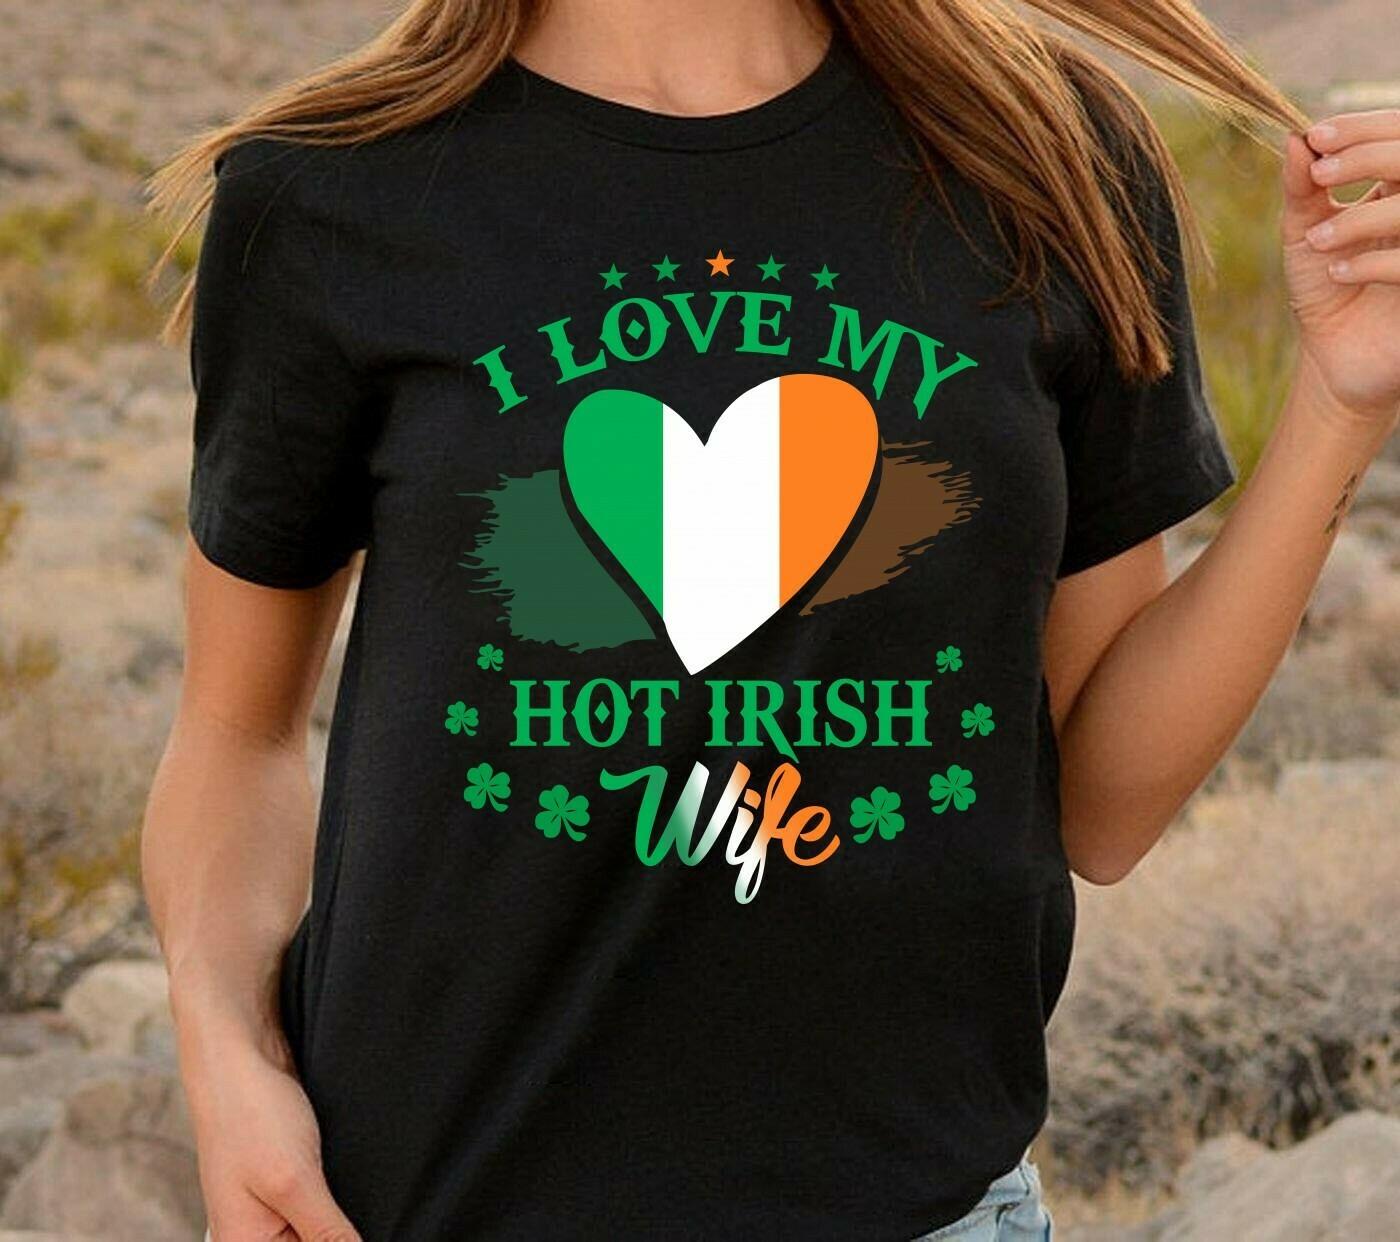 I Love My Hot Irish Wife: Funny Irish Saying For St Patrick'S Day heart flag,Love My Hot Smart and Beautiful Irish Wife  T-Shirt Hoodie Sweatshirt Sweater Tee Kids Youth Gifts Jolly Family Gifts